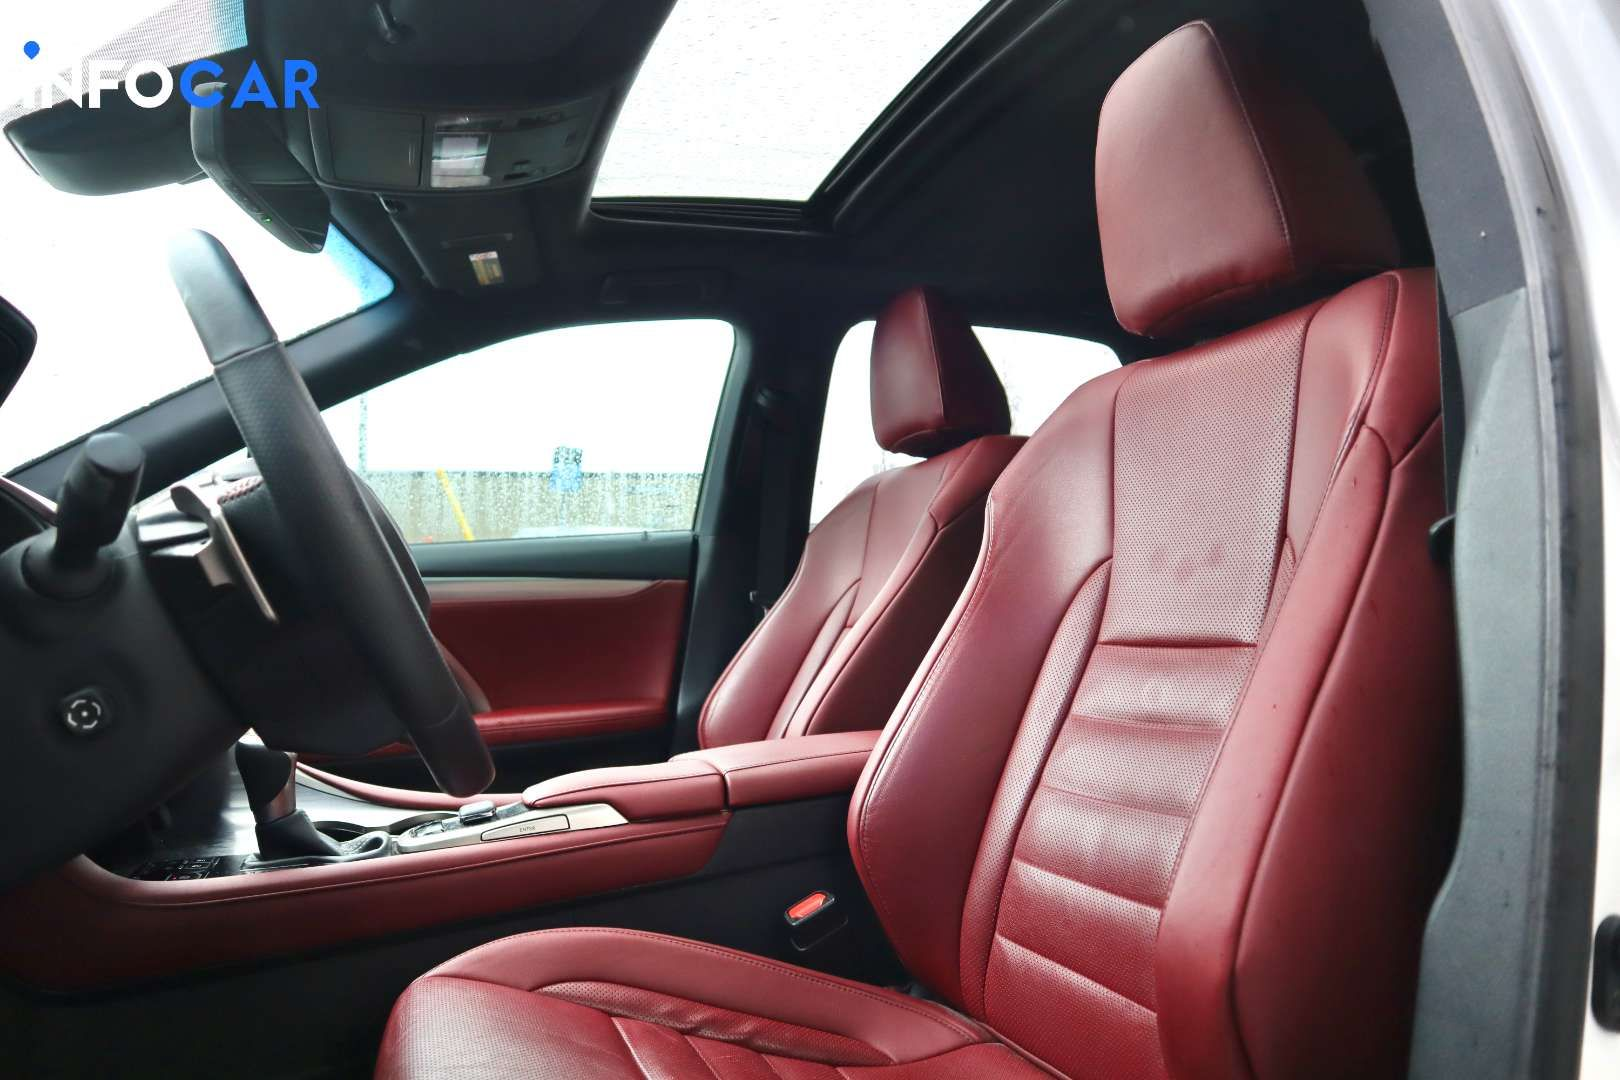 2019 Lexus RX 350 F Sport - INFOCAR - Toronto's Most Comprehensive New and Used Auto Trading Platform